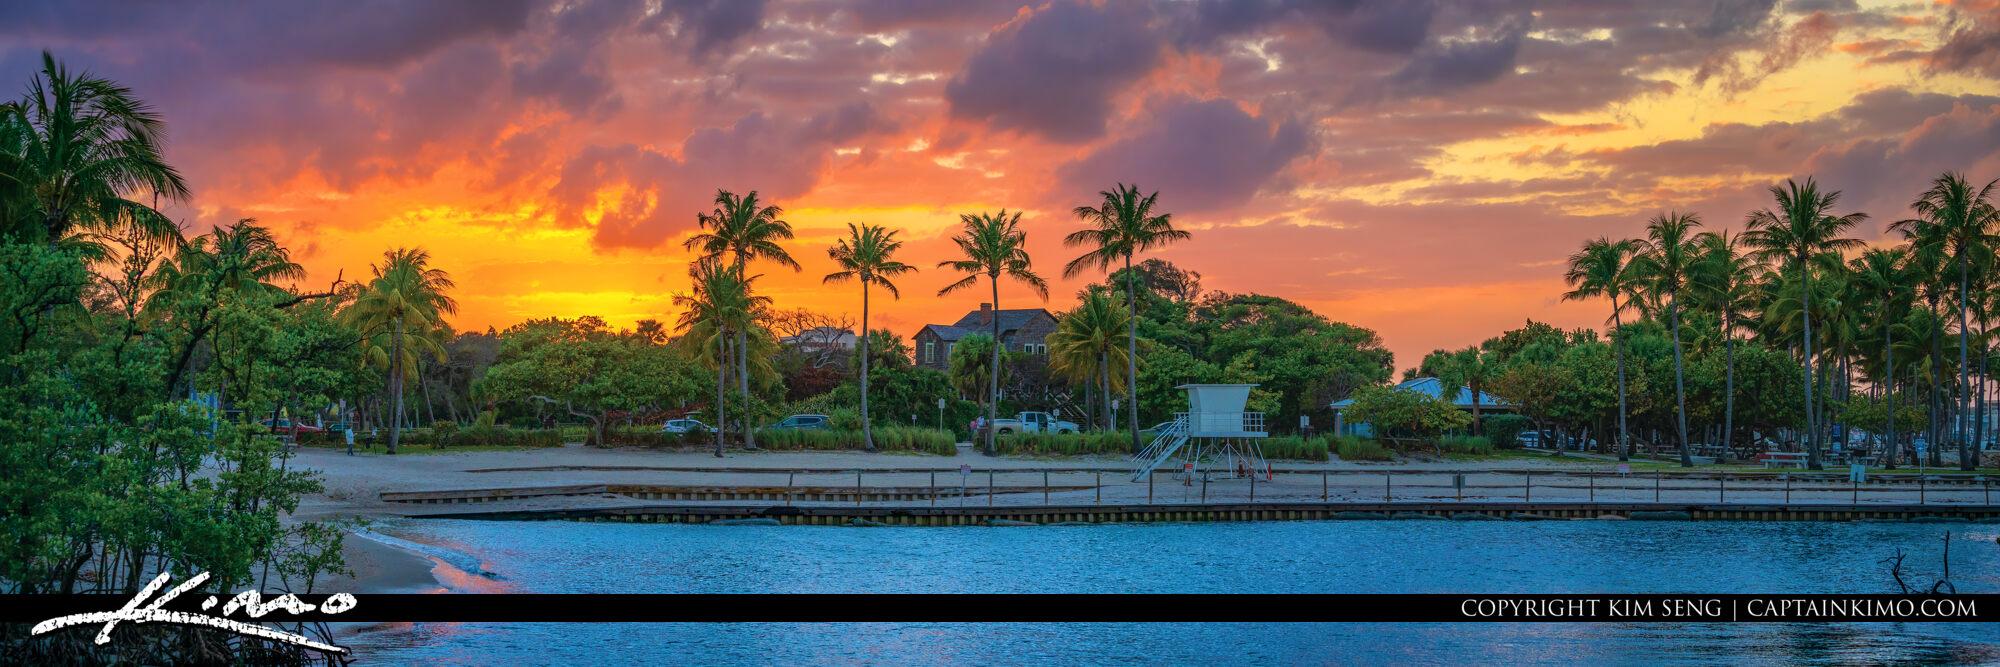 Dubois Park Lagoon Sunset Panoramic Jupiter Florida